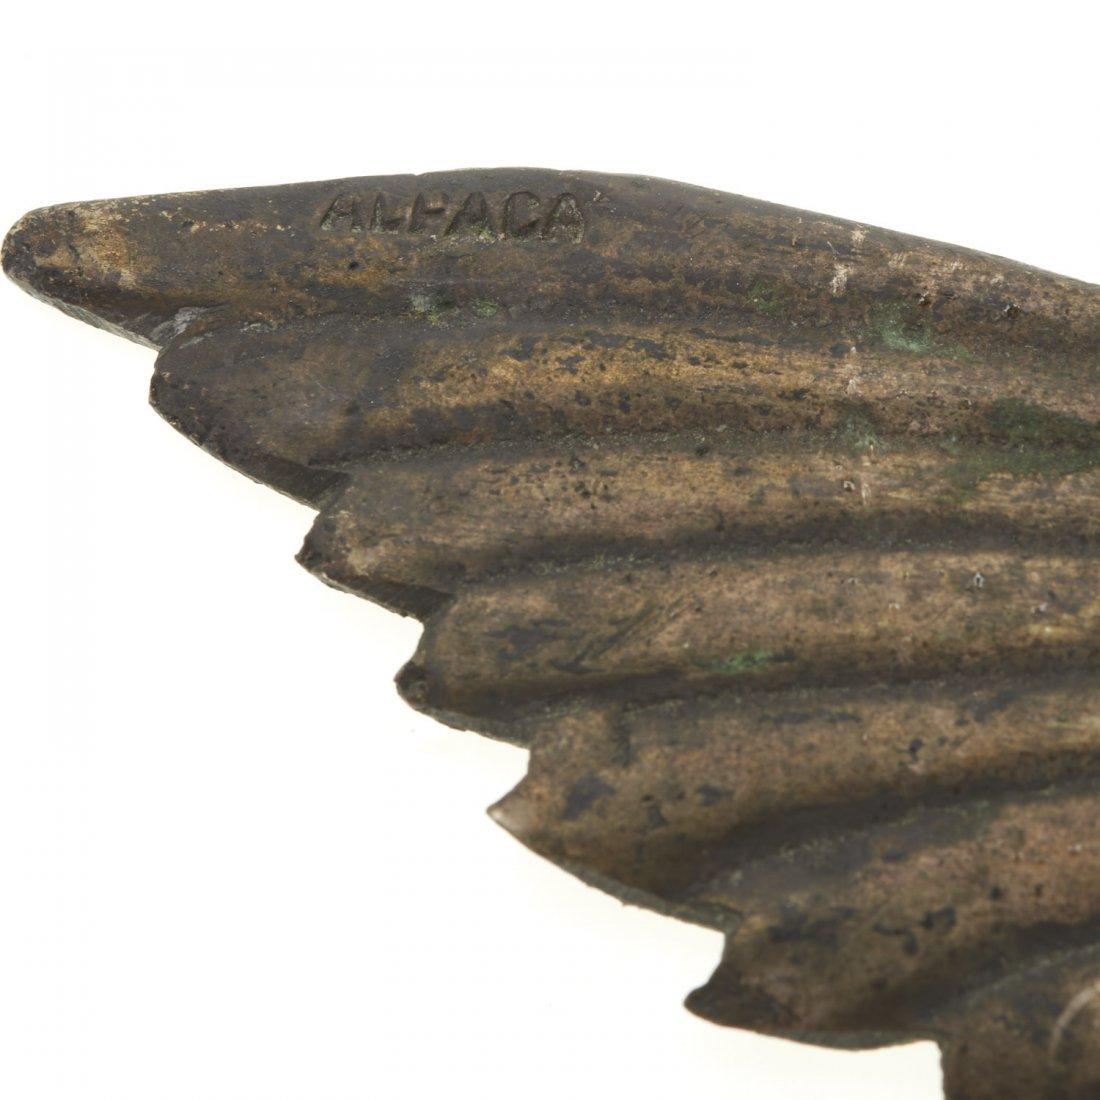 (2) Articulated alpaca alloy koi fish - 8